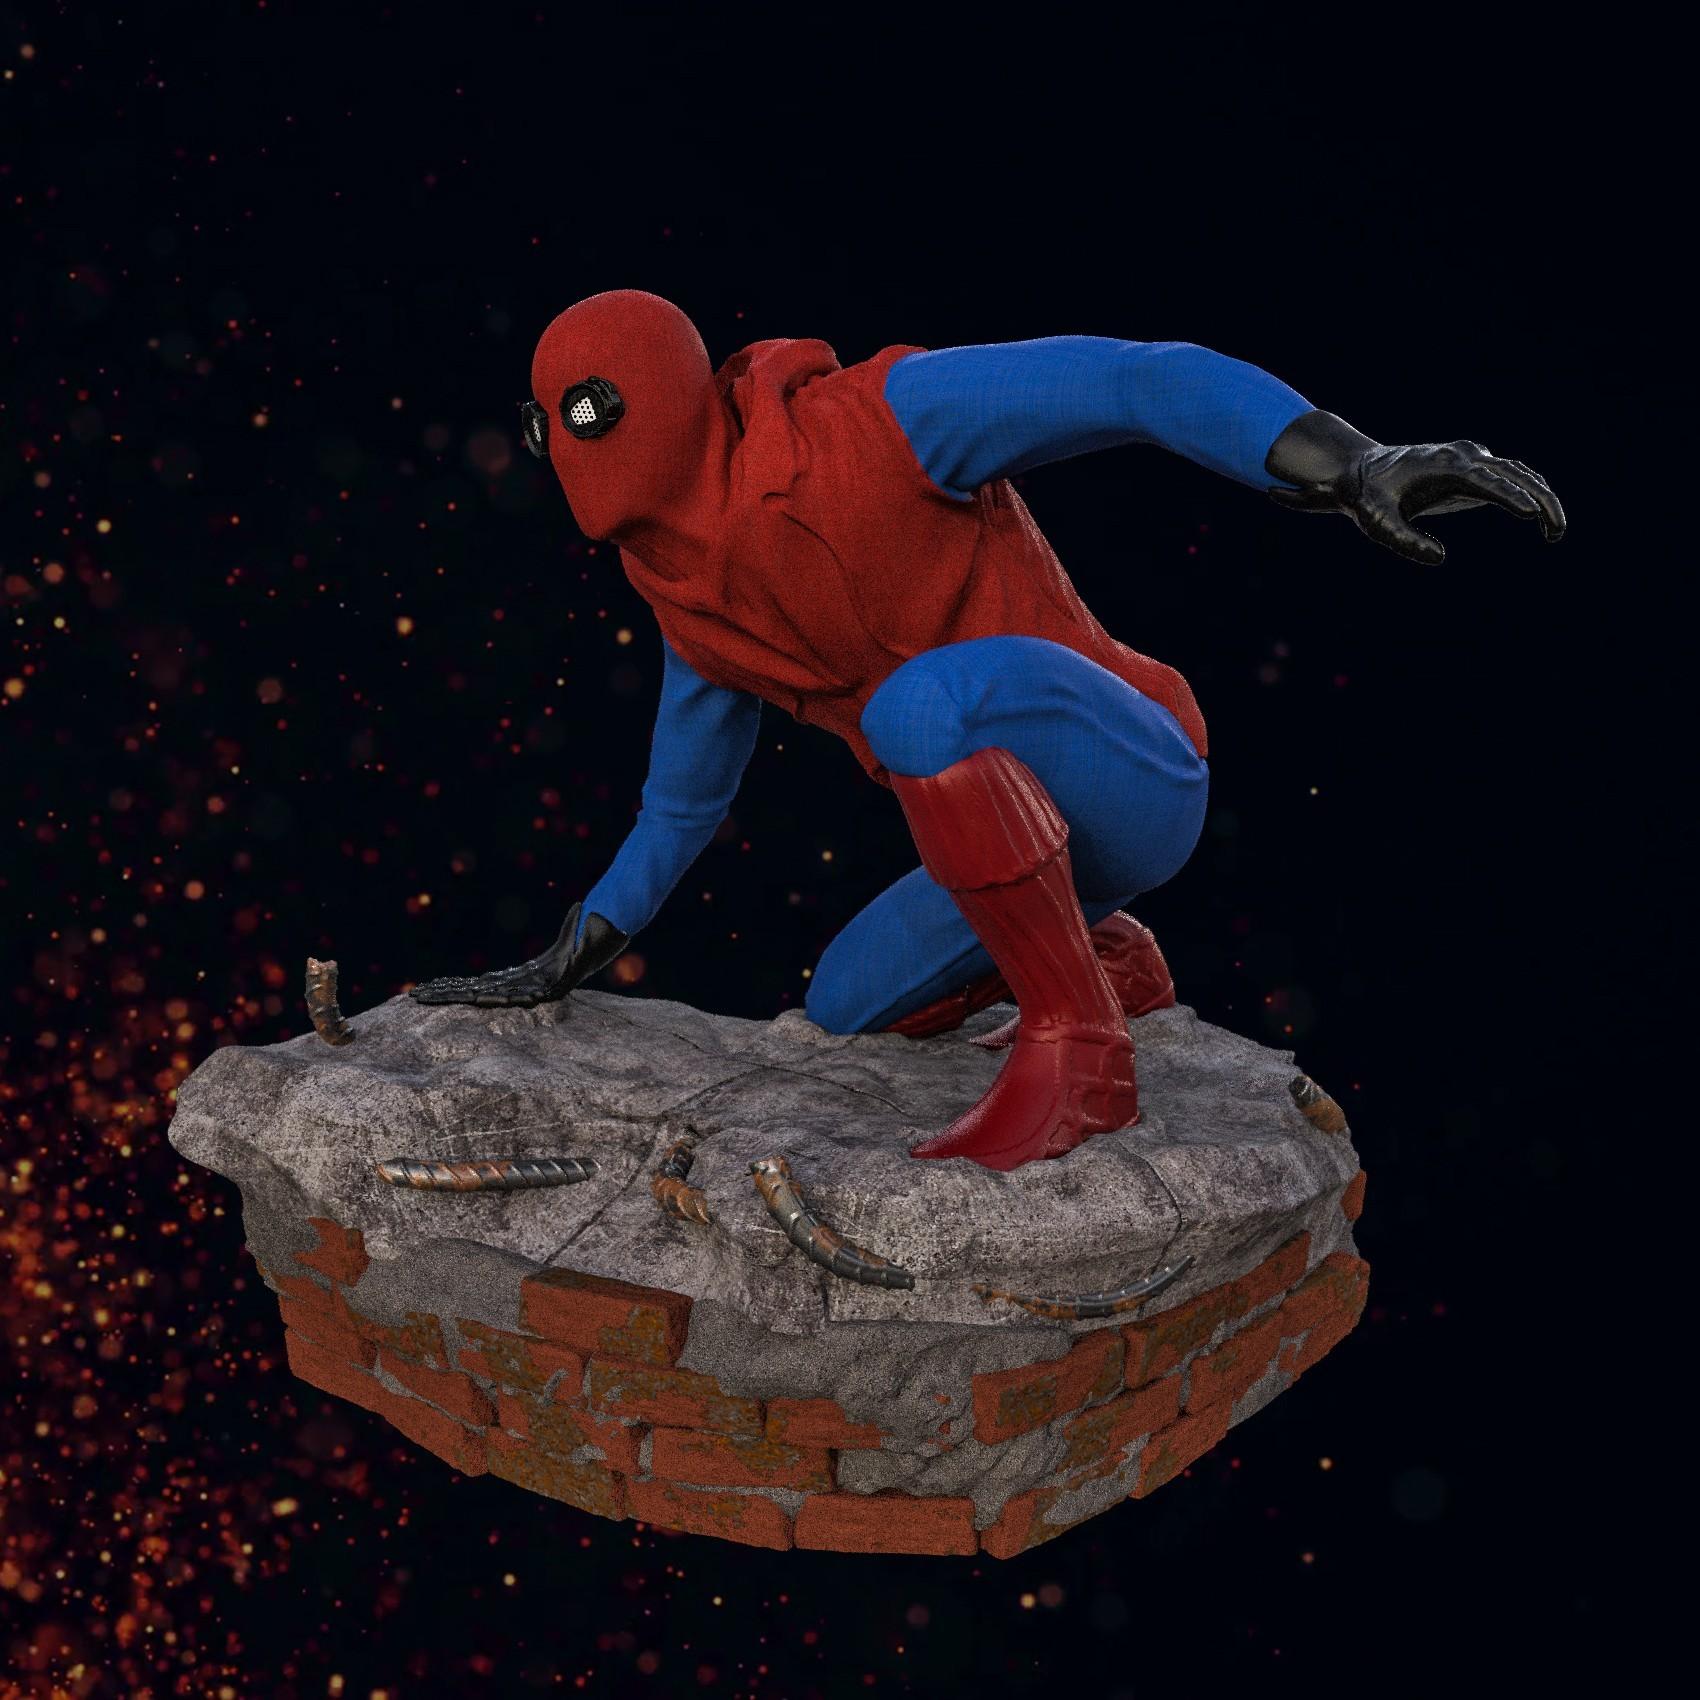 7.jpg Download STL file Spider-Man Homemade Suit • Design to 3D print, tolgaaxu